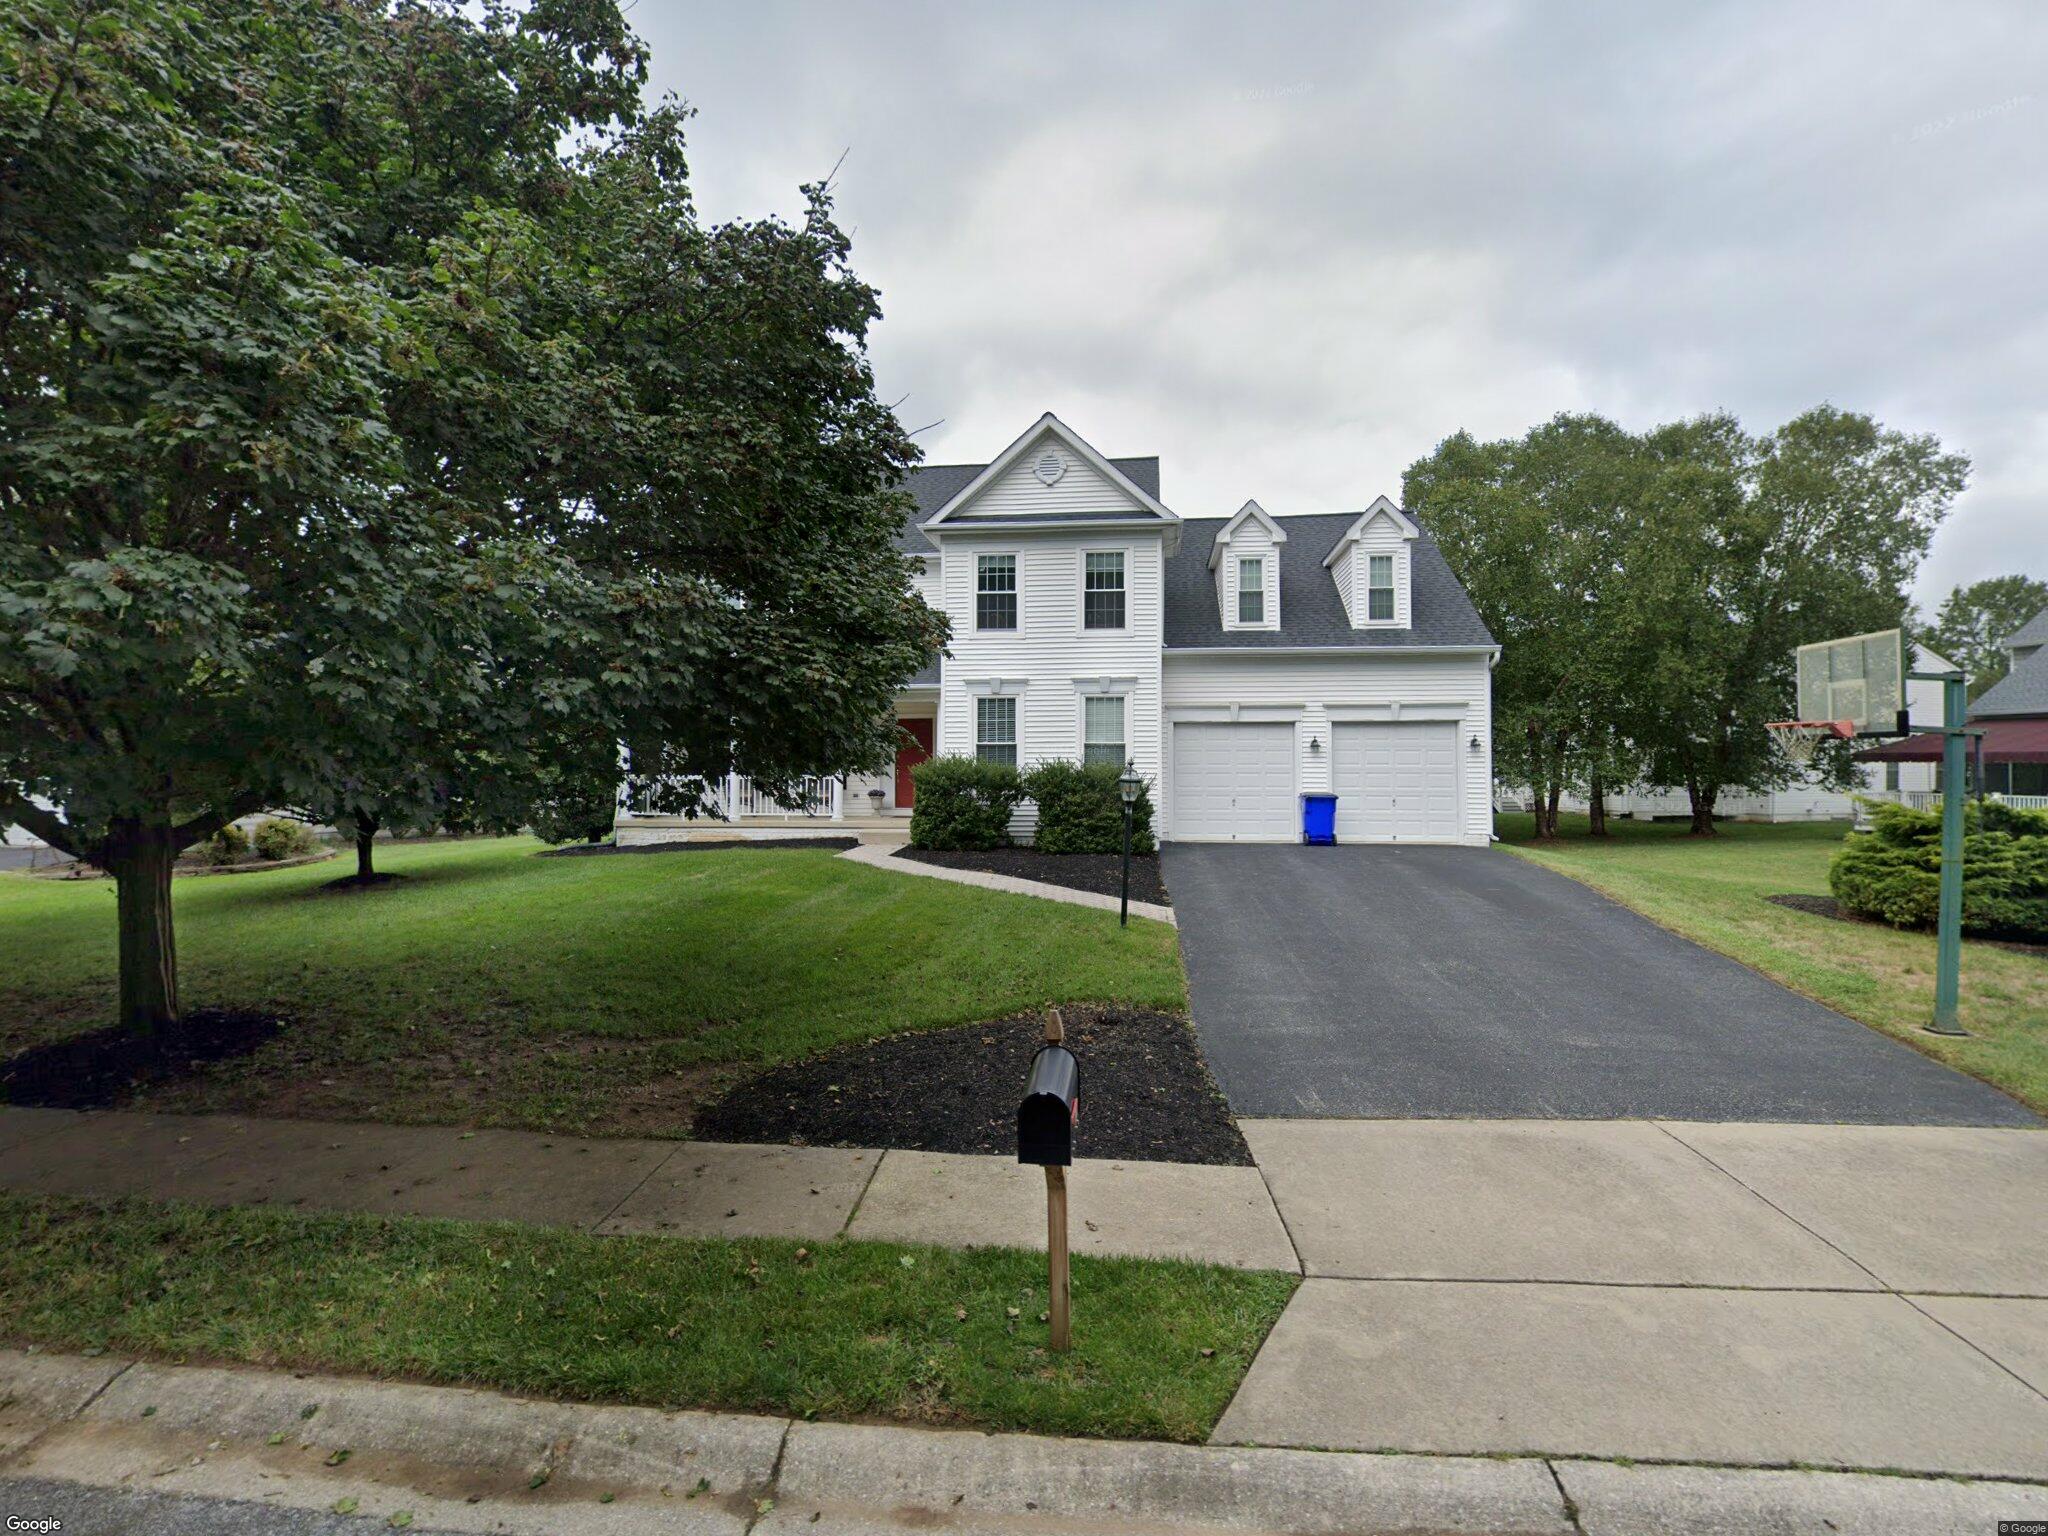 2256 ballard way, ellicott city, md 21042 | trulia